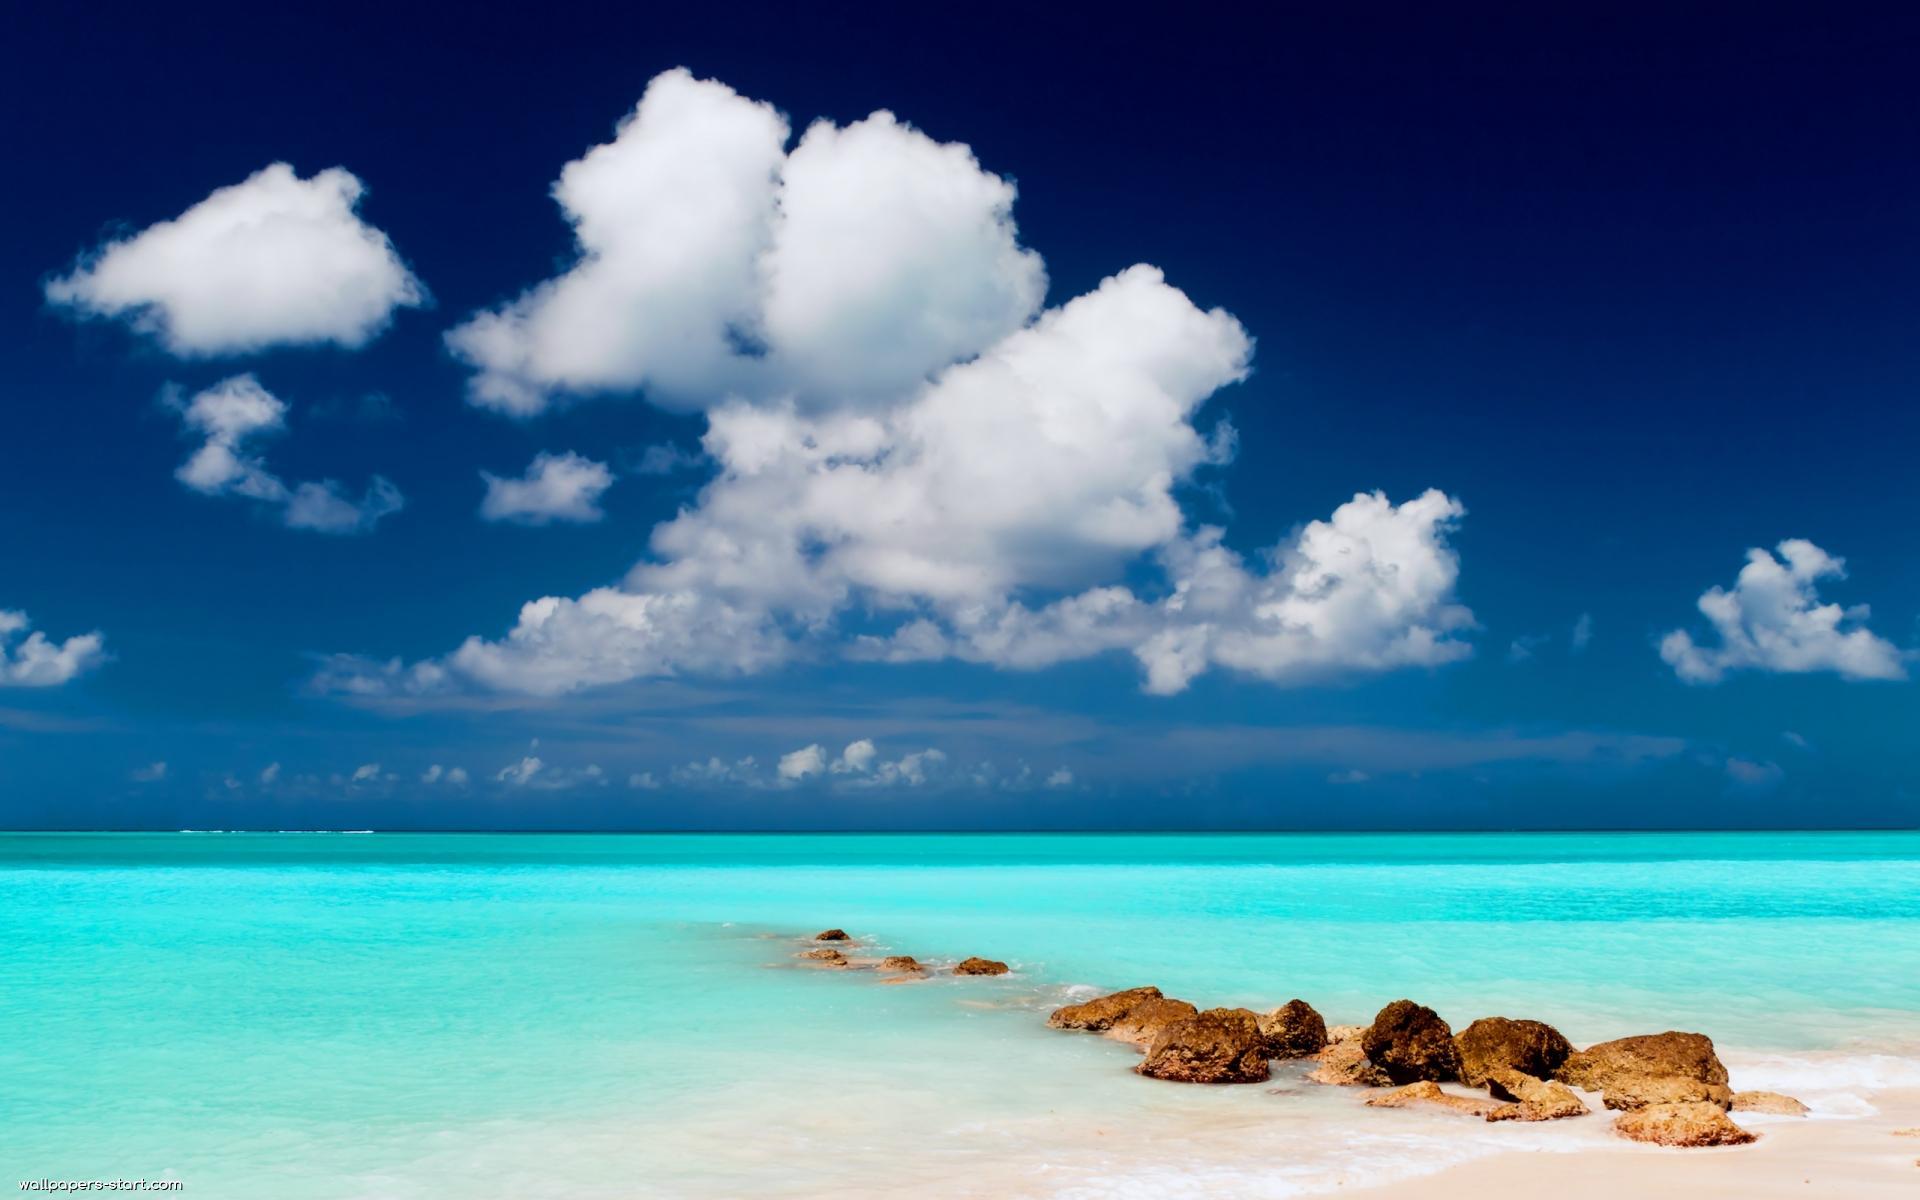 Sfondi Hd Mare Blu Per Desktop Caraibi Sfondi Hd Gratis